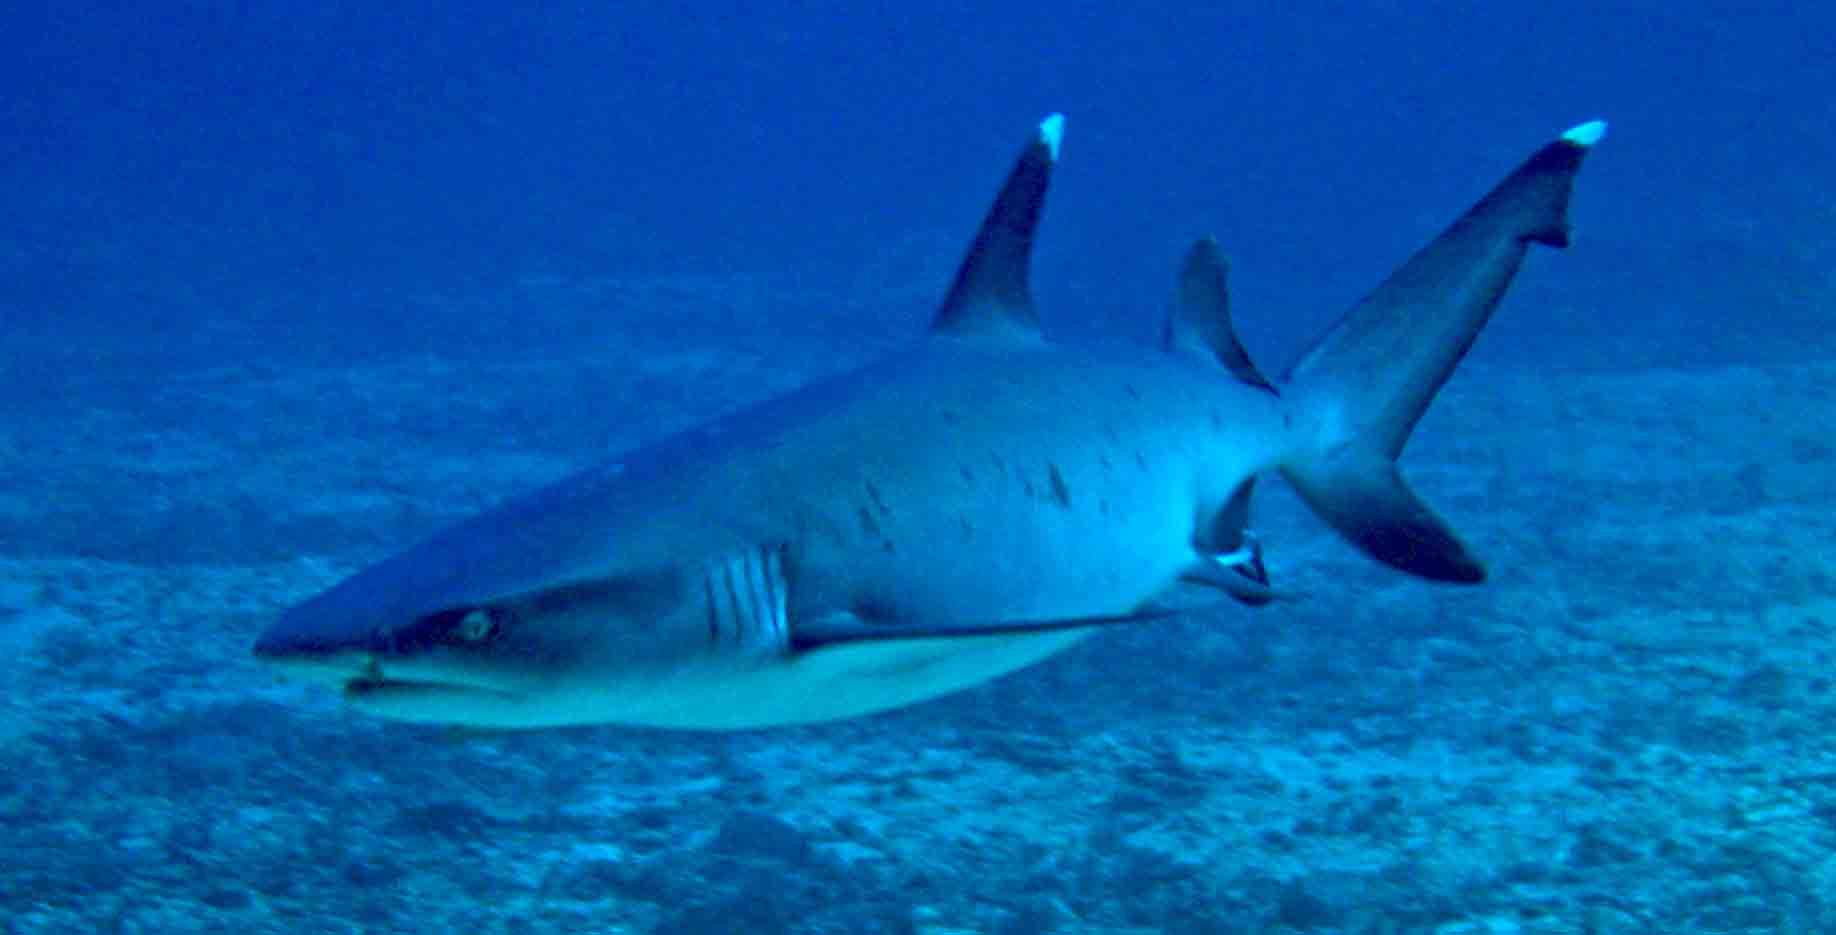 Gili-Trawangan-Lombok-Activities-Activity-Scuba-Scubadive-Scubadiving-Dive-Diving-101.jpg